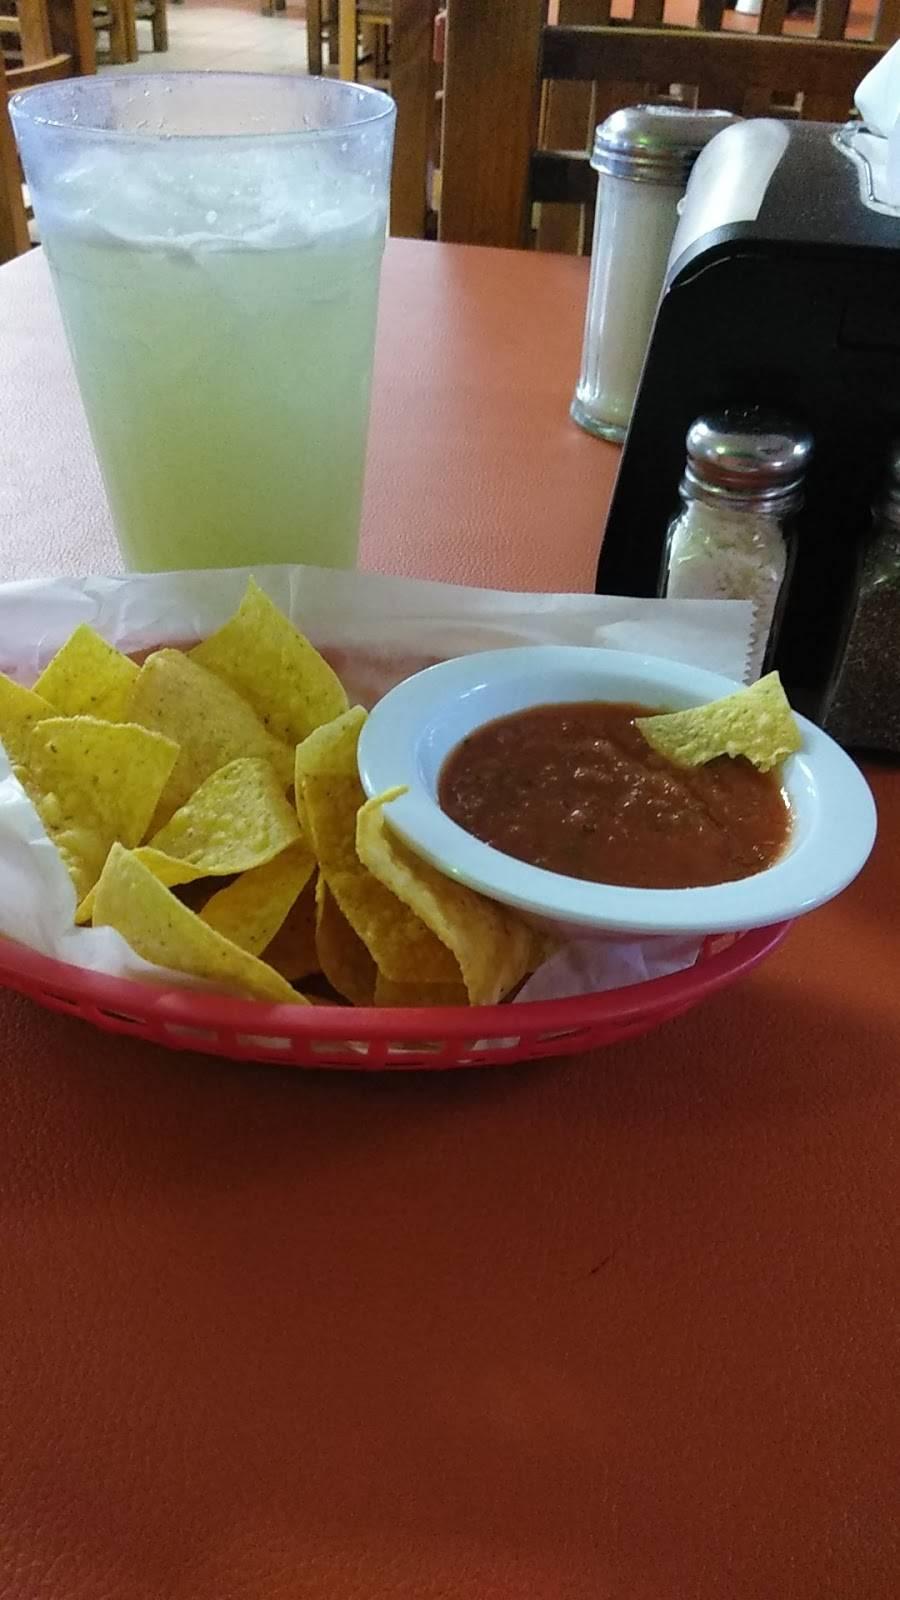 El Corral Tex-Mex Restaurant | restaurant | 1415 N 14th St, Kingsville, TX 78363, USA | 3615921574 OR +1 361-592-1574